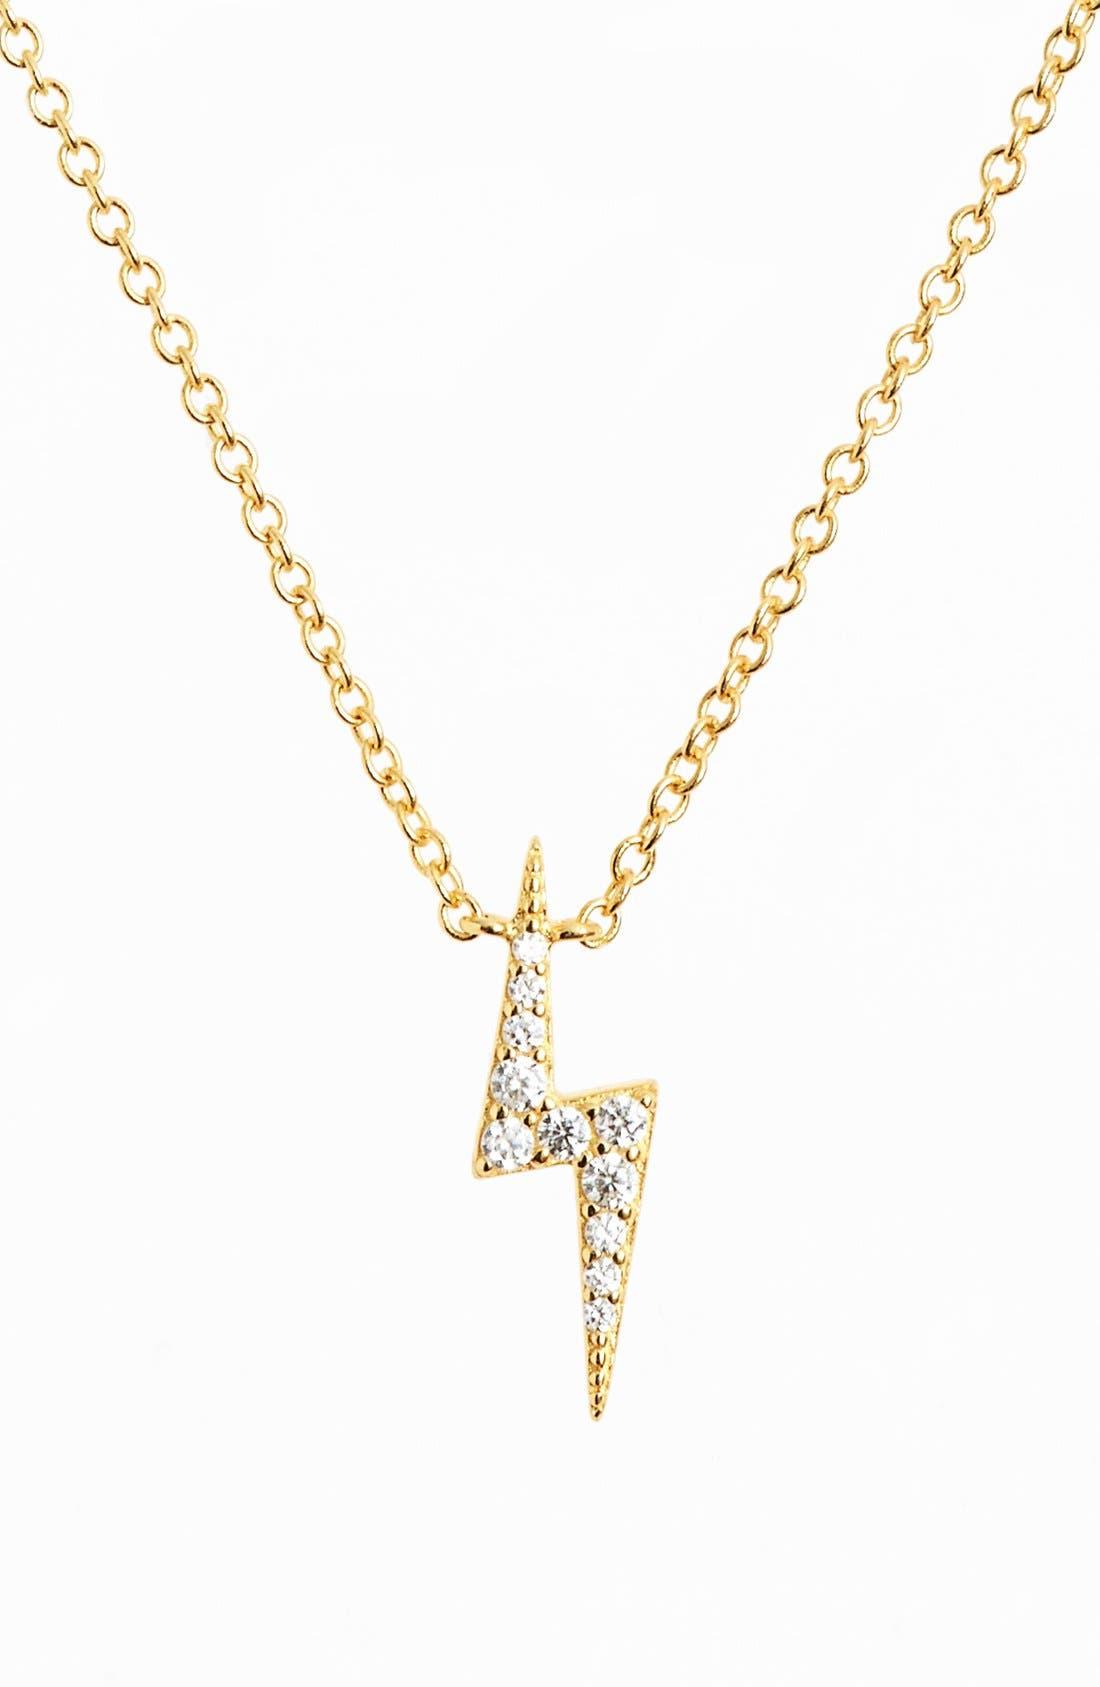 Alternate Image 1 Selected - Sugar Bean Jewelry Lightning Bolt Pendant Necklace